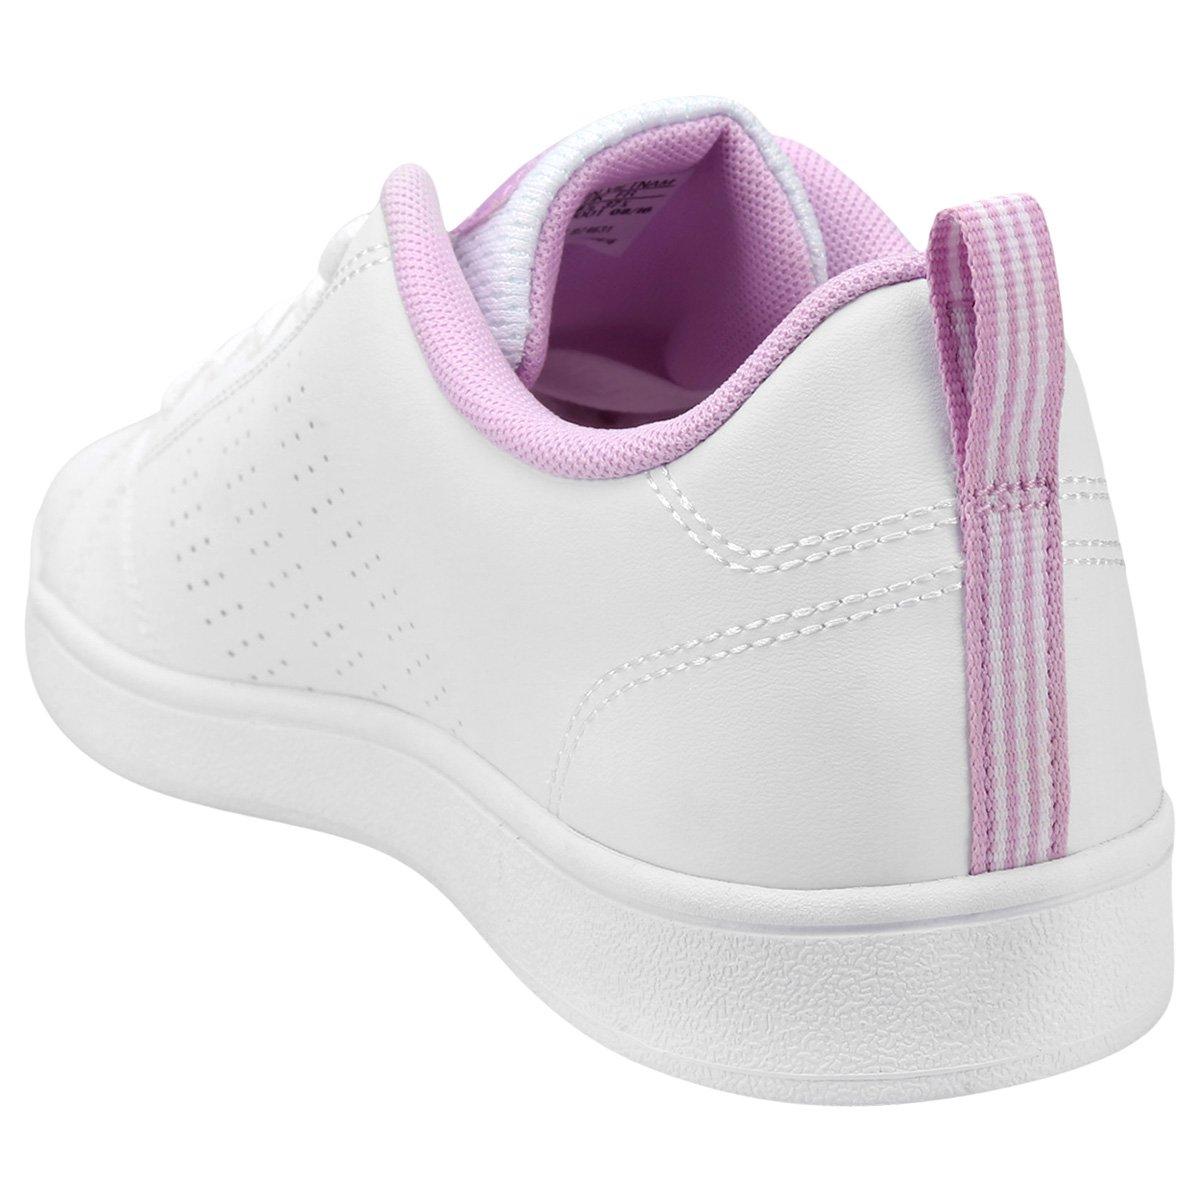 7efdda8344 Tênis Adidas Vs Advantage Clean K Infantil - Branco - Compre Agora ...